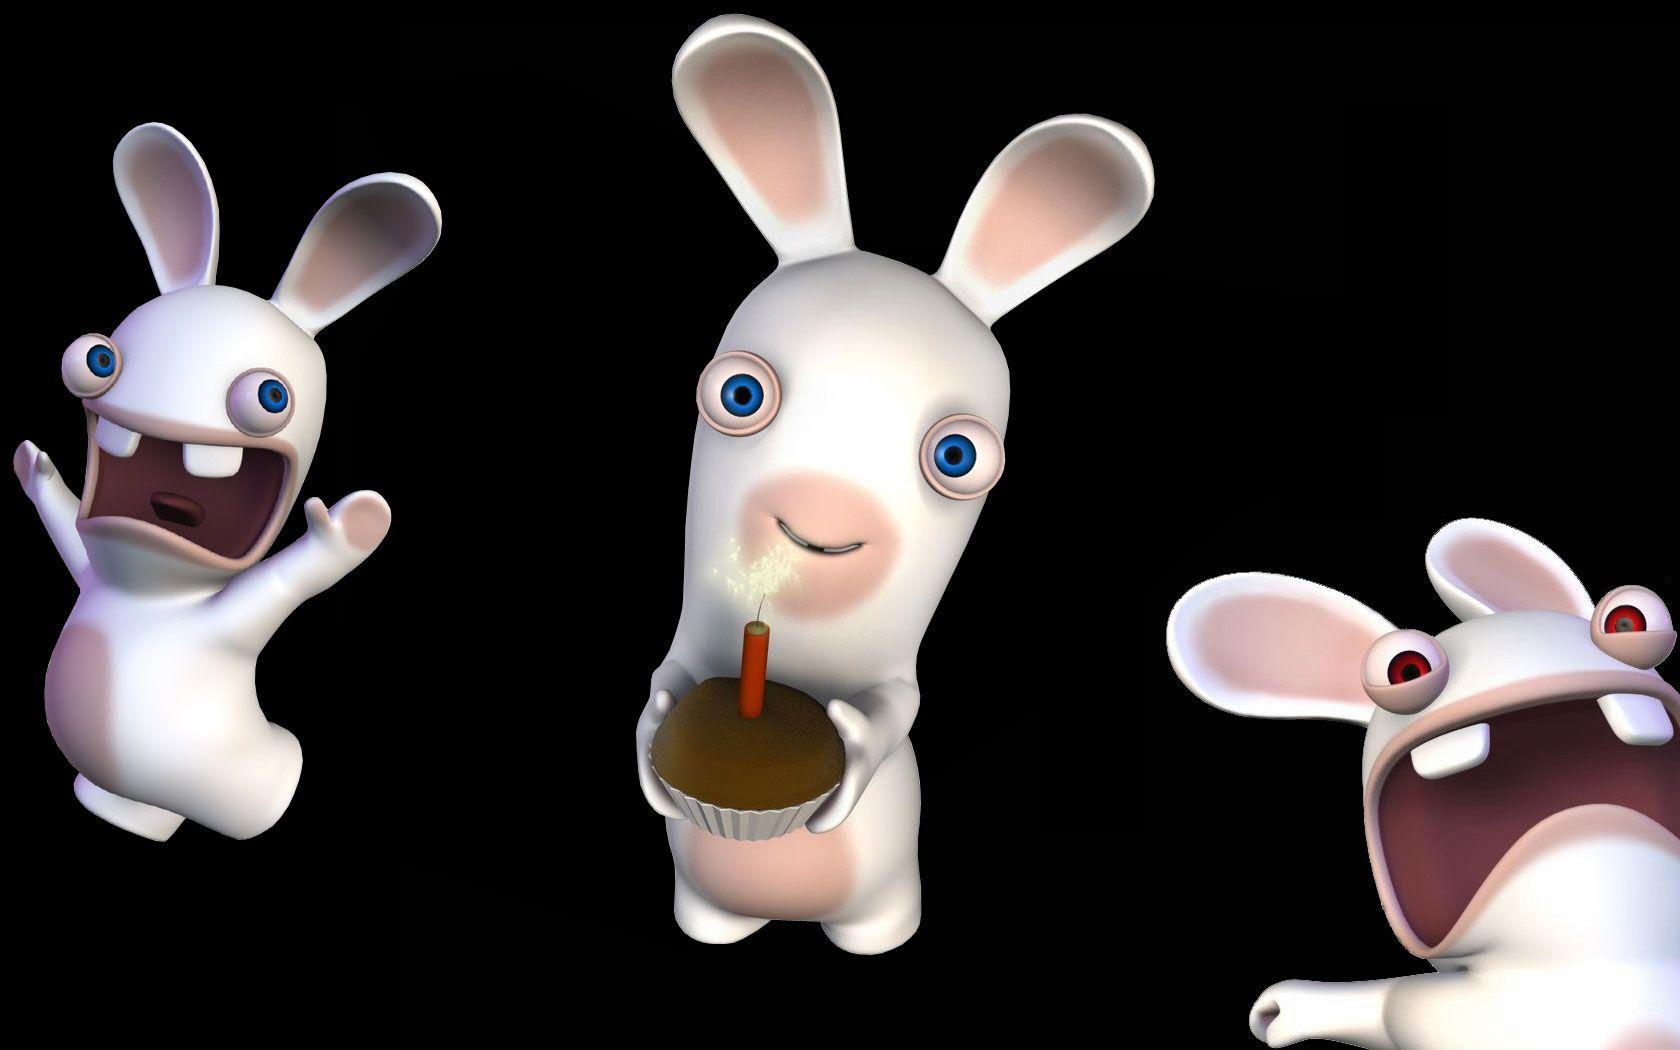 Fond cran p ques les lapins cr tins images p ques pinterest les lapins cr tins fond - Lapin cretin image ...